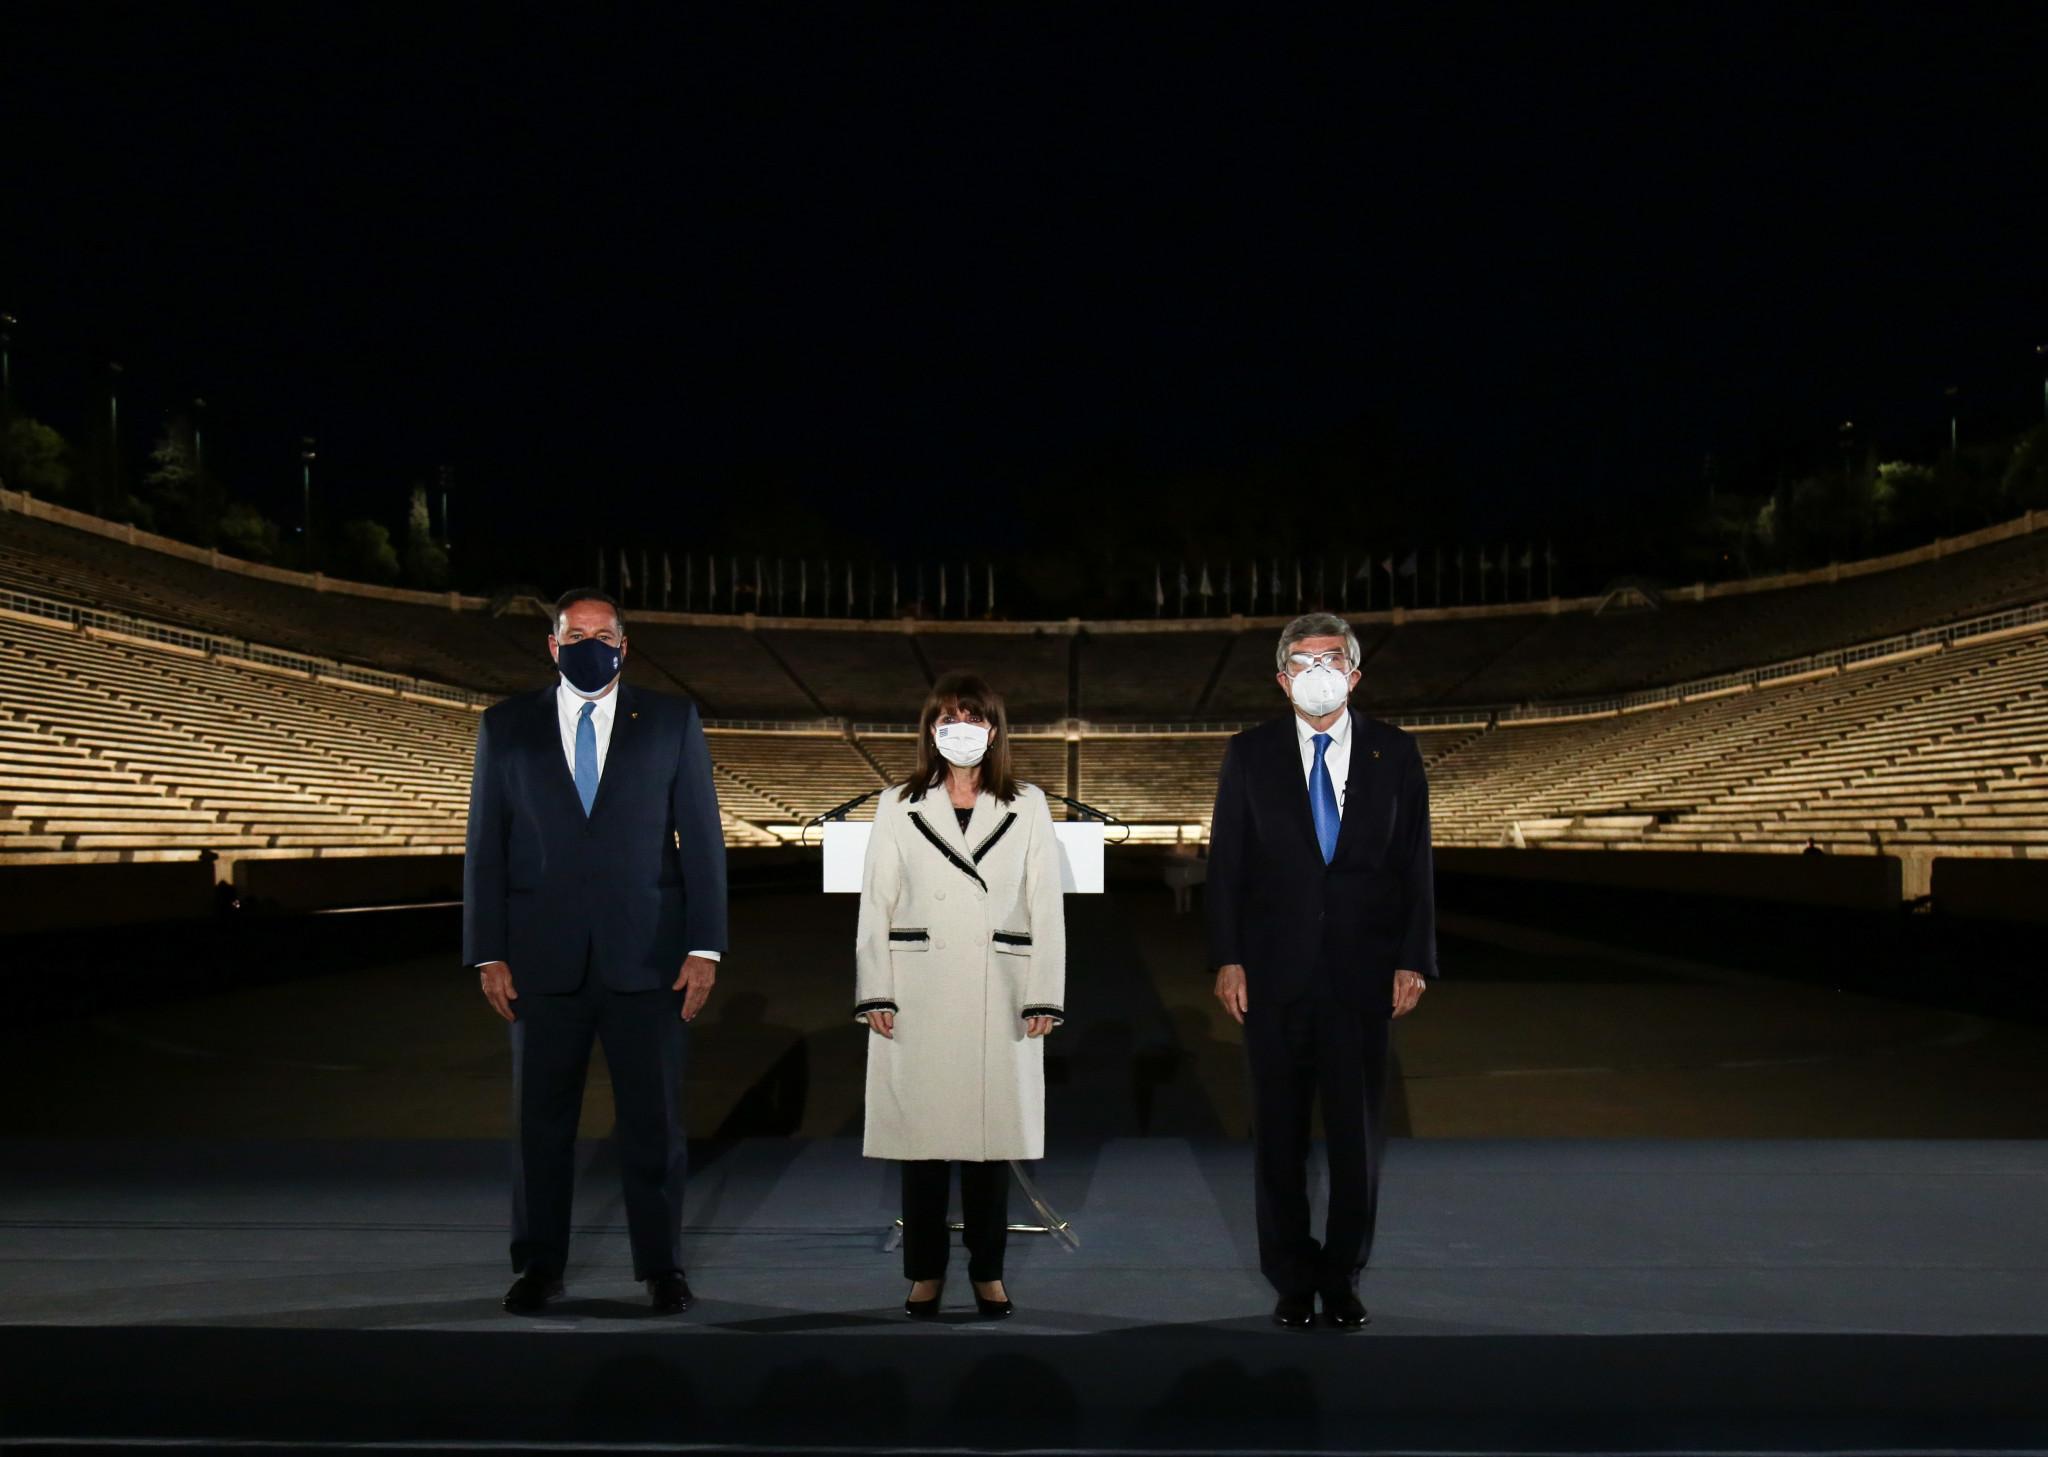 Thomas Bach has inaugurated the renewed lighting at the Panathinaiko Stadium in Athens ©HOC